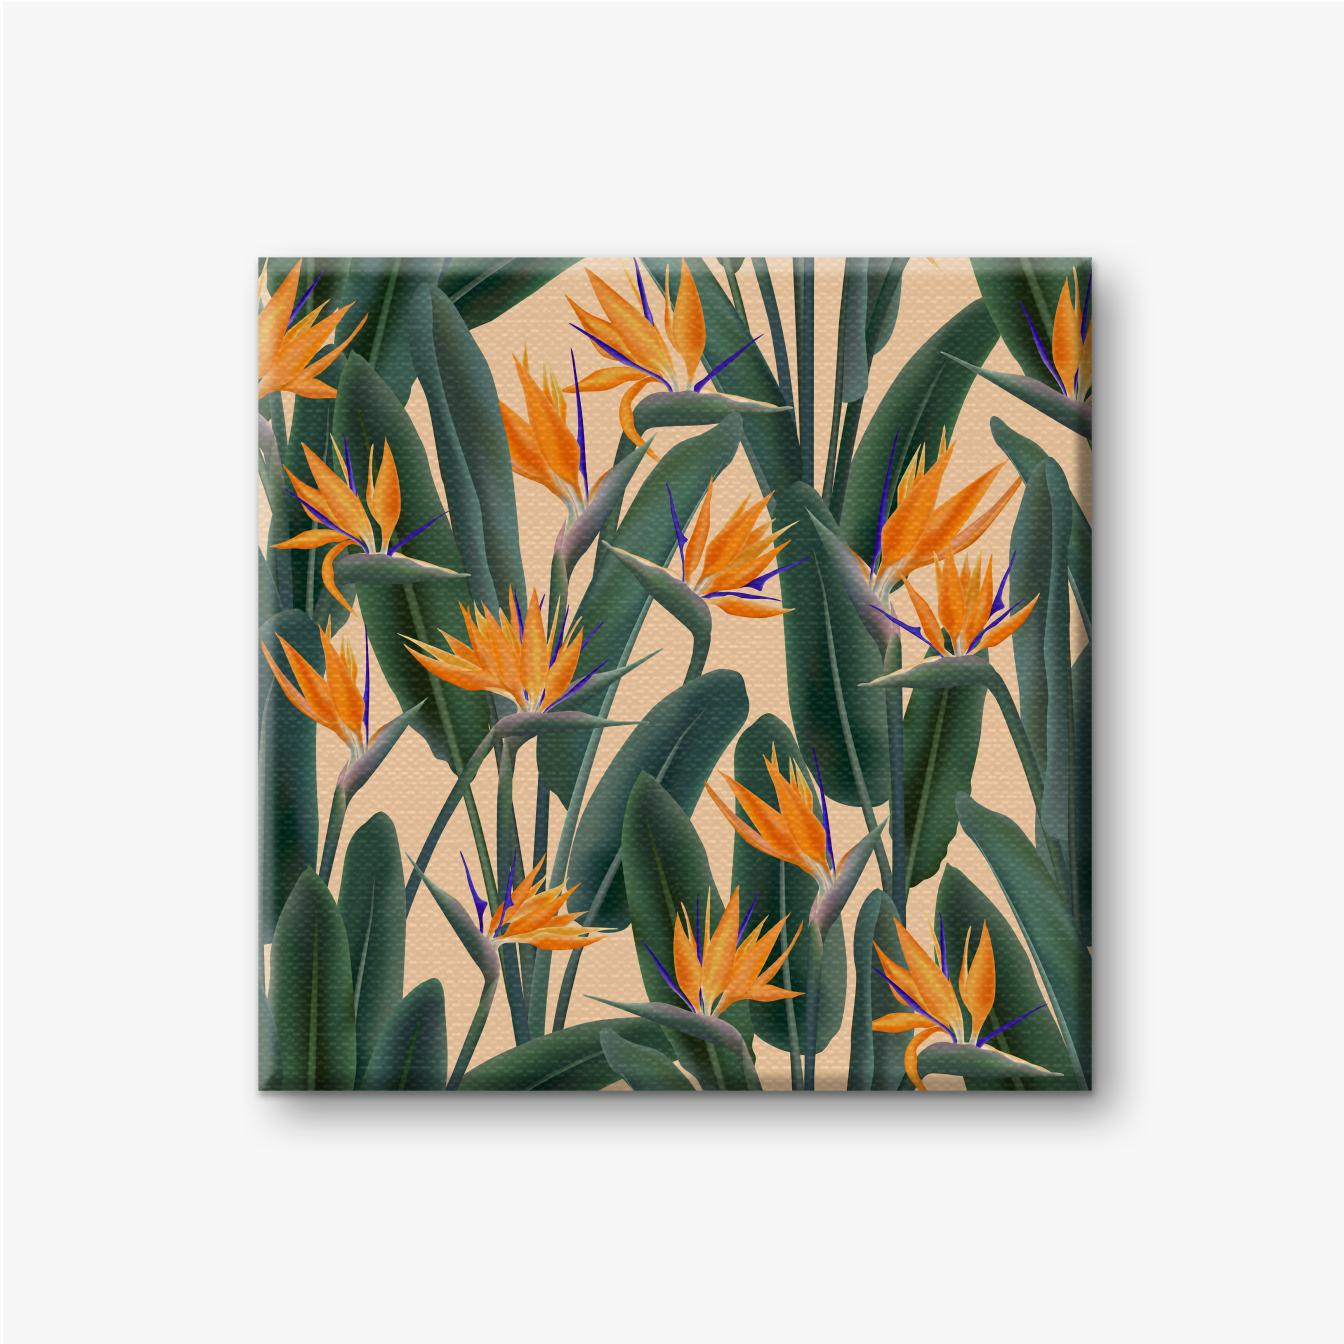 Leinwandbild Viele Strelitzia-Paradiesvögel